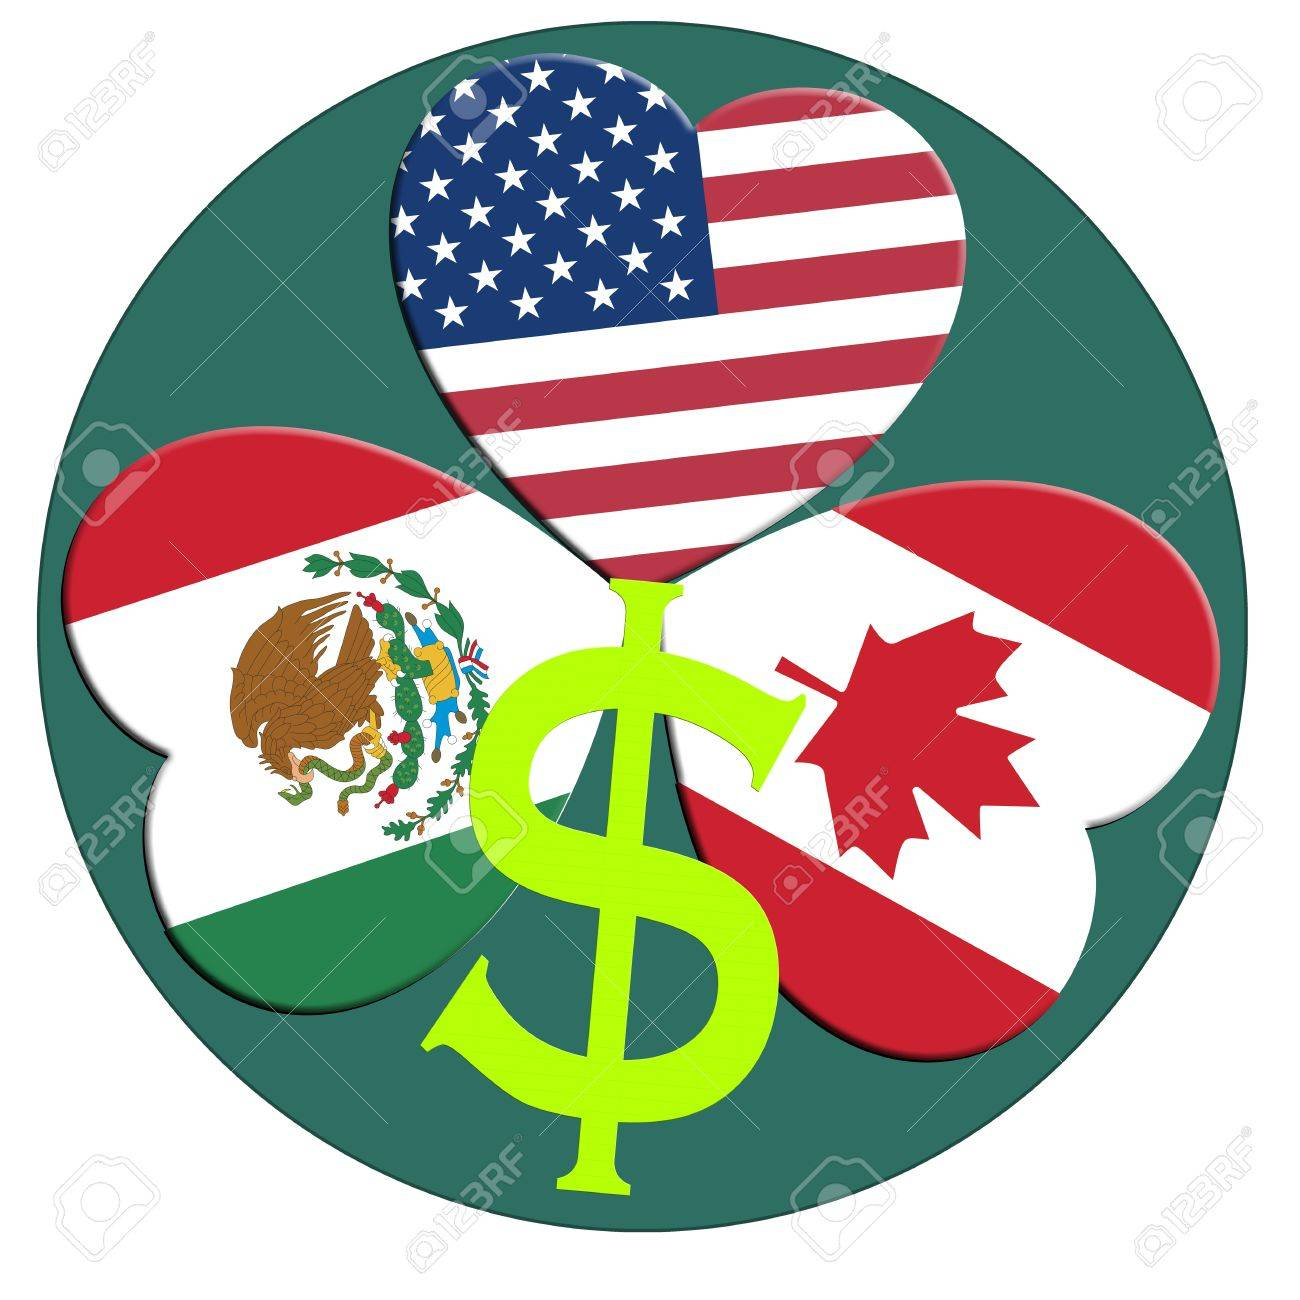 Nafta north american free trade agreement between canada mexico nafta north american free trade agreement between canada mexico usa stock photo platinumwayz